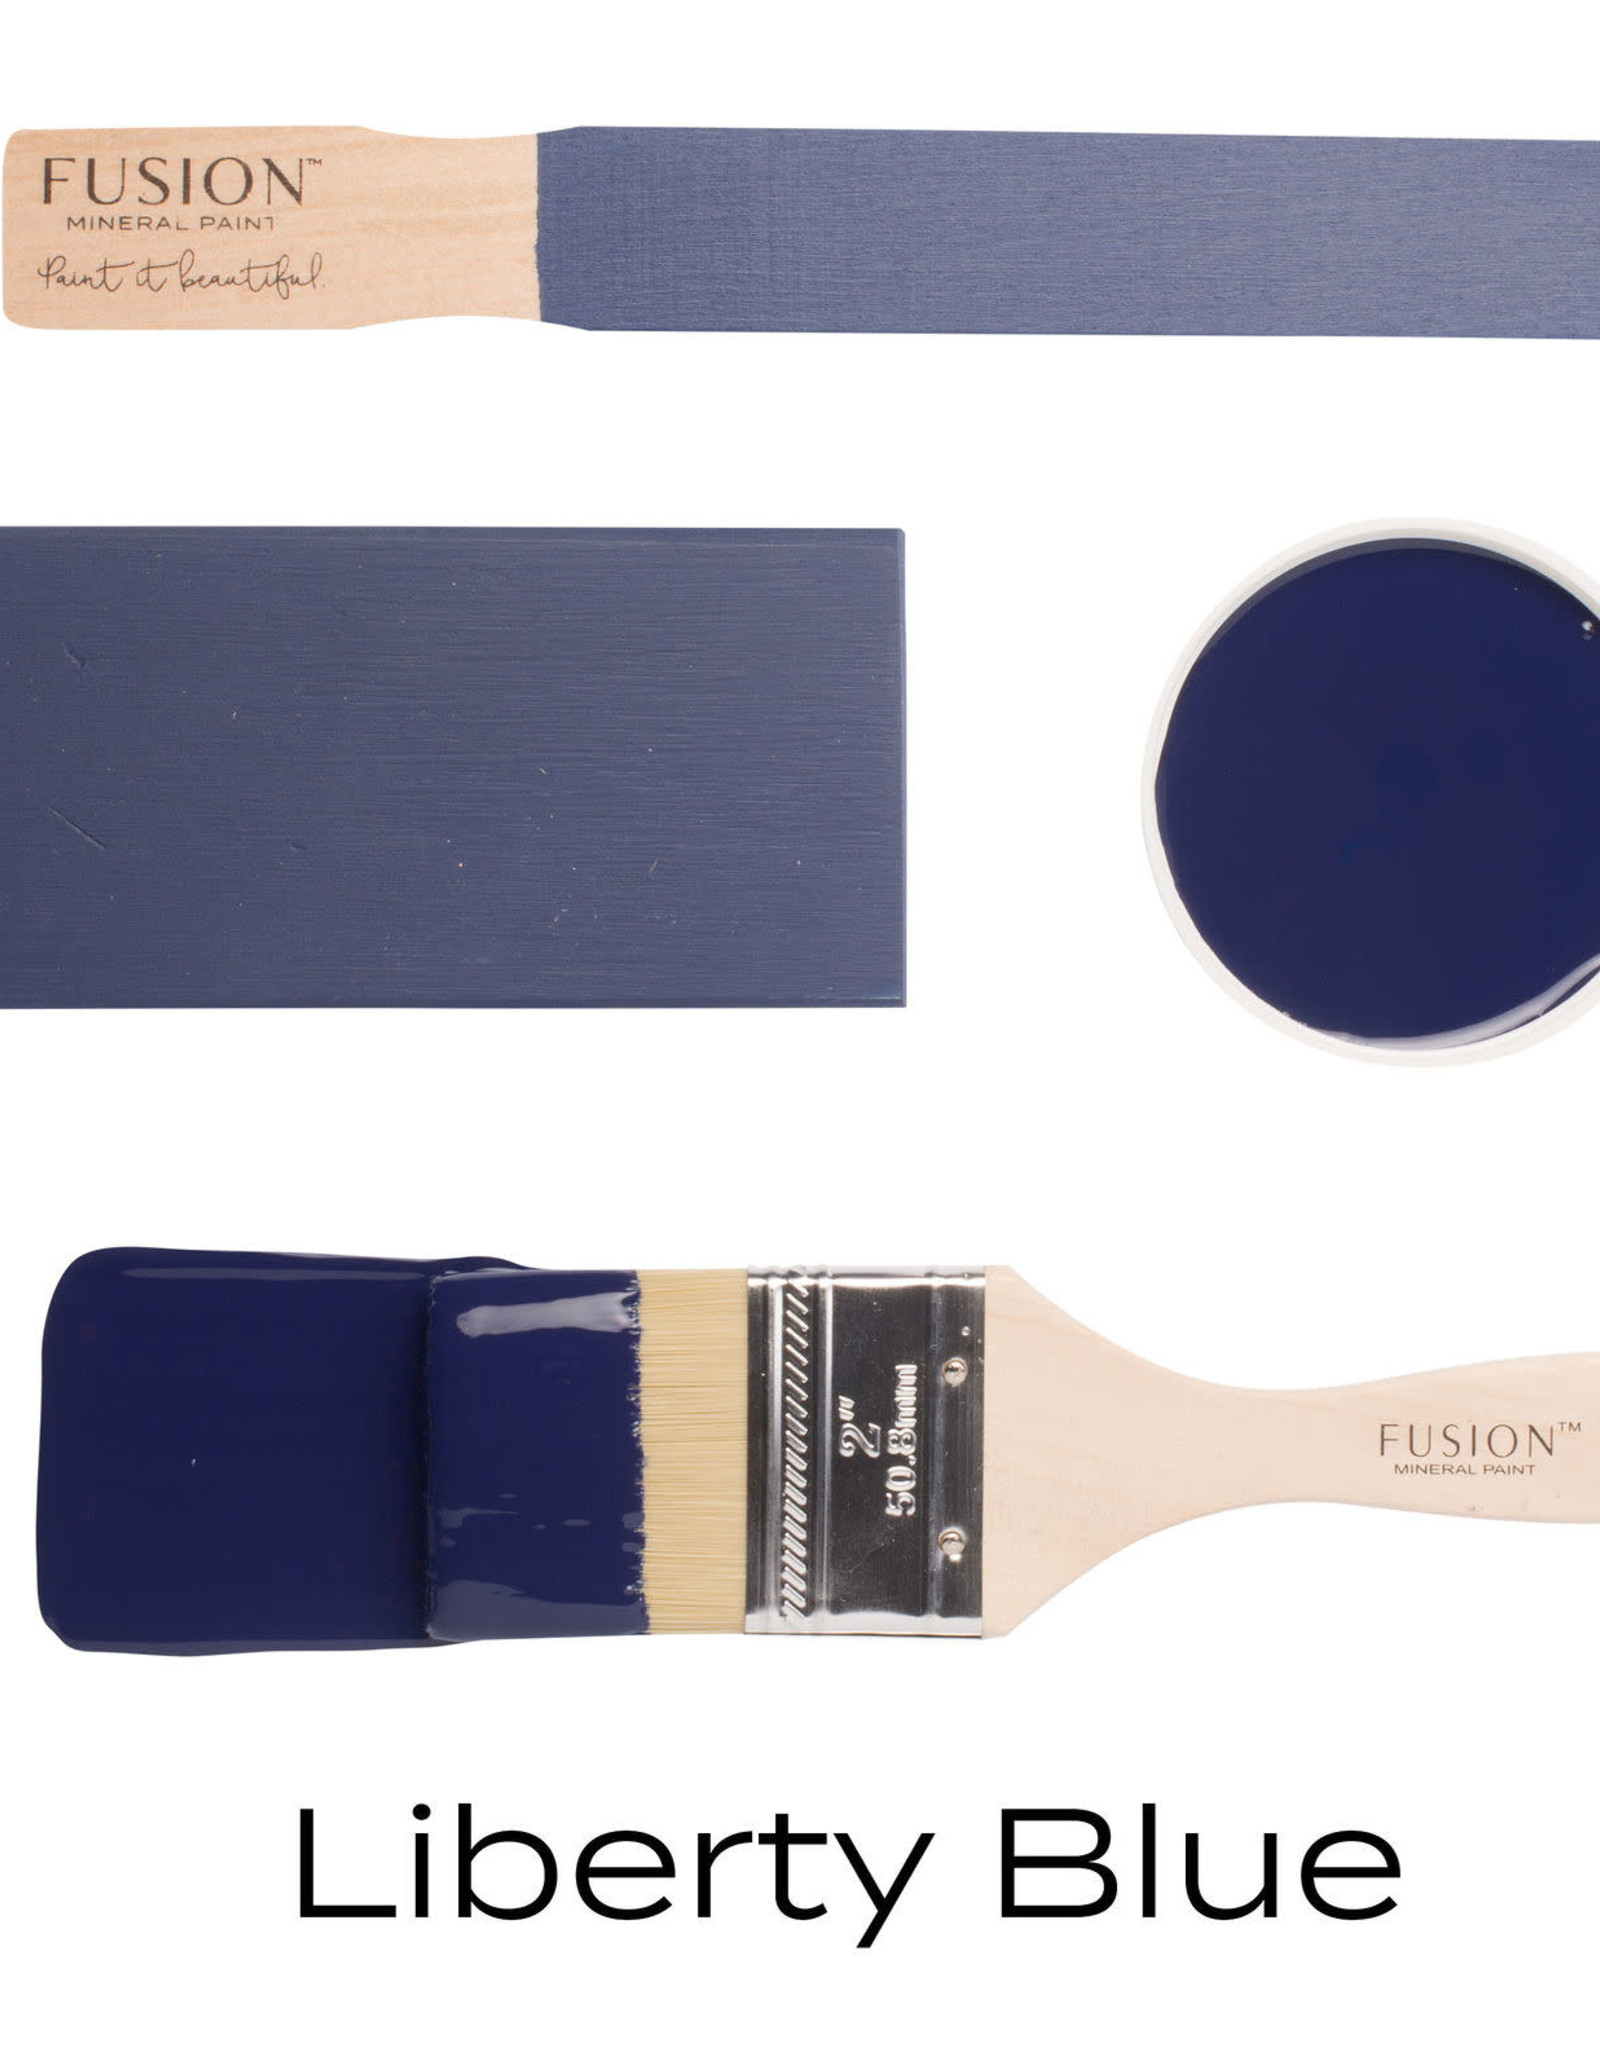 Fusion Mineral Paint Fusion Mineral Paint - Liberty Blue 37ml